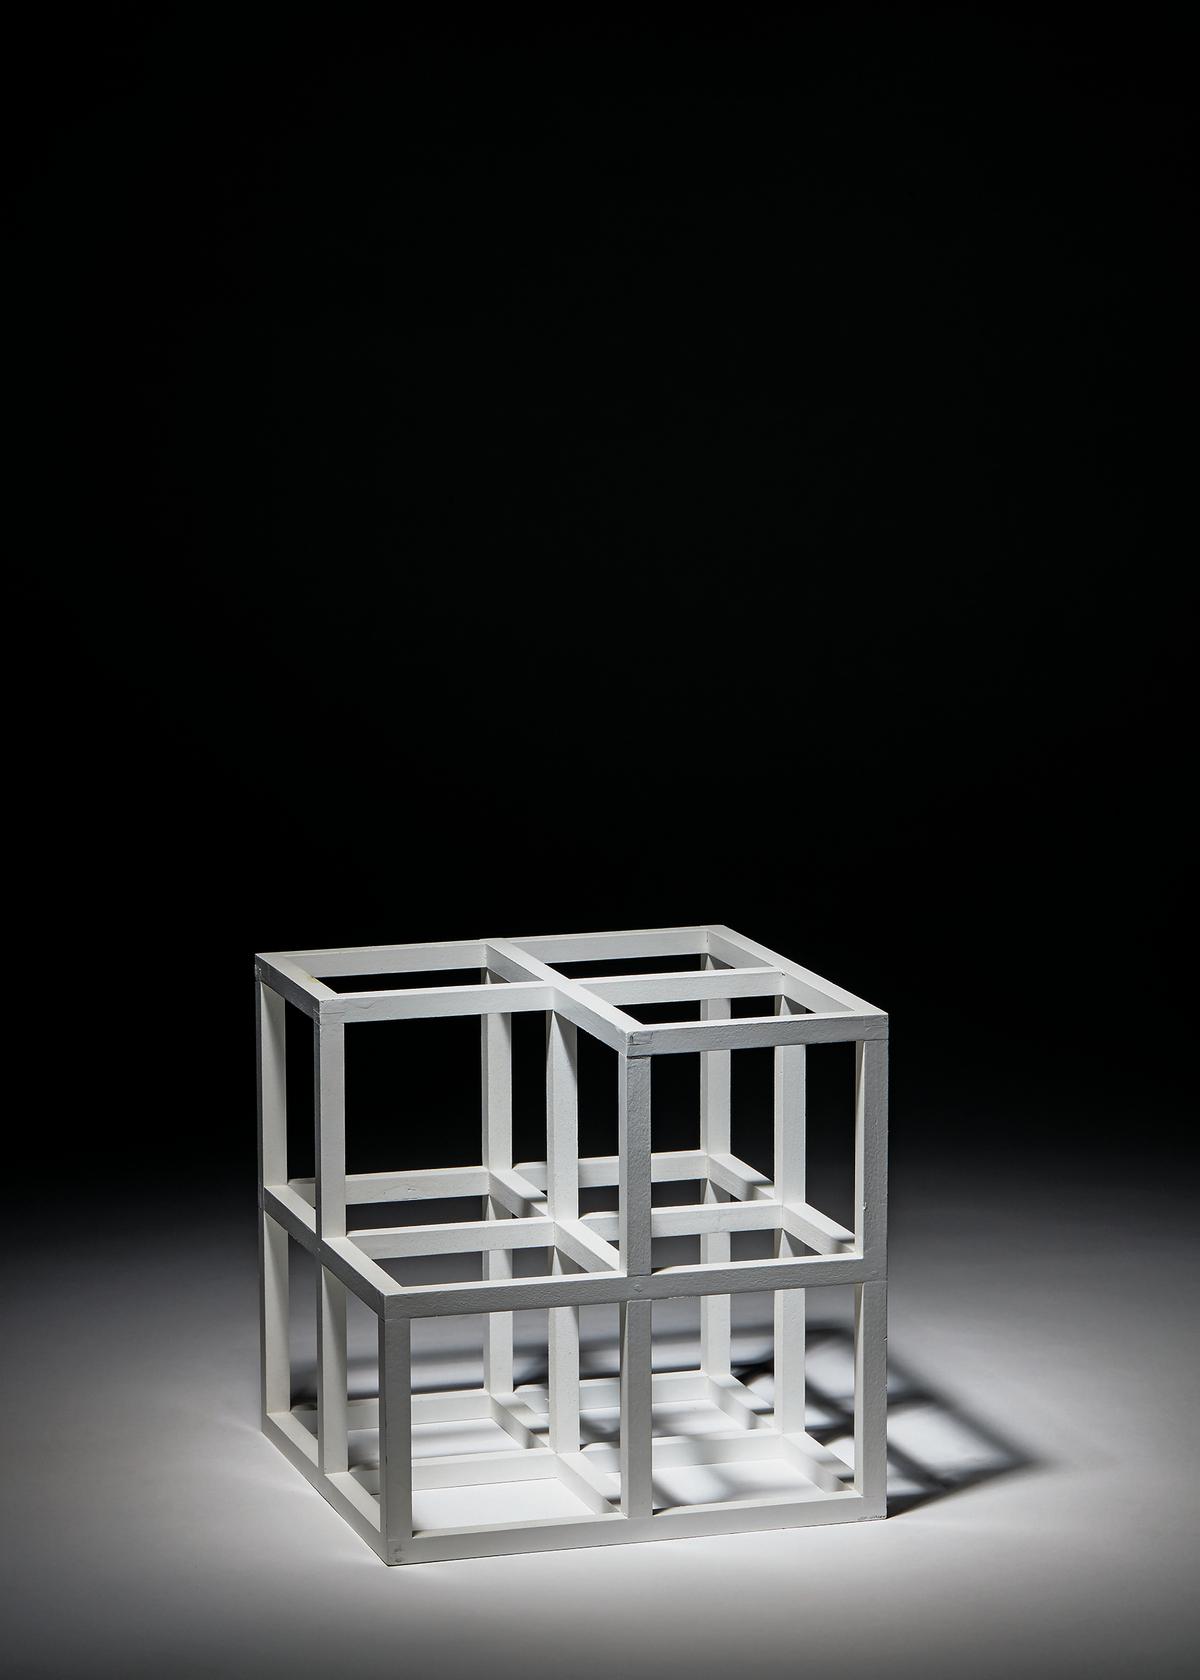 Grid_Sculpture.jpg